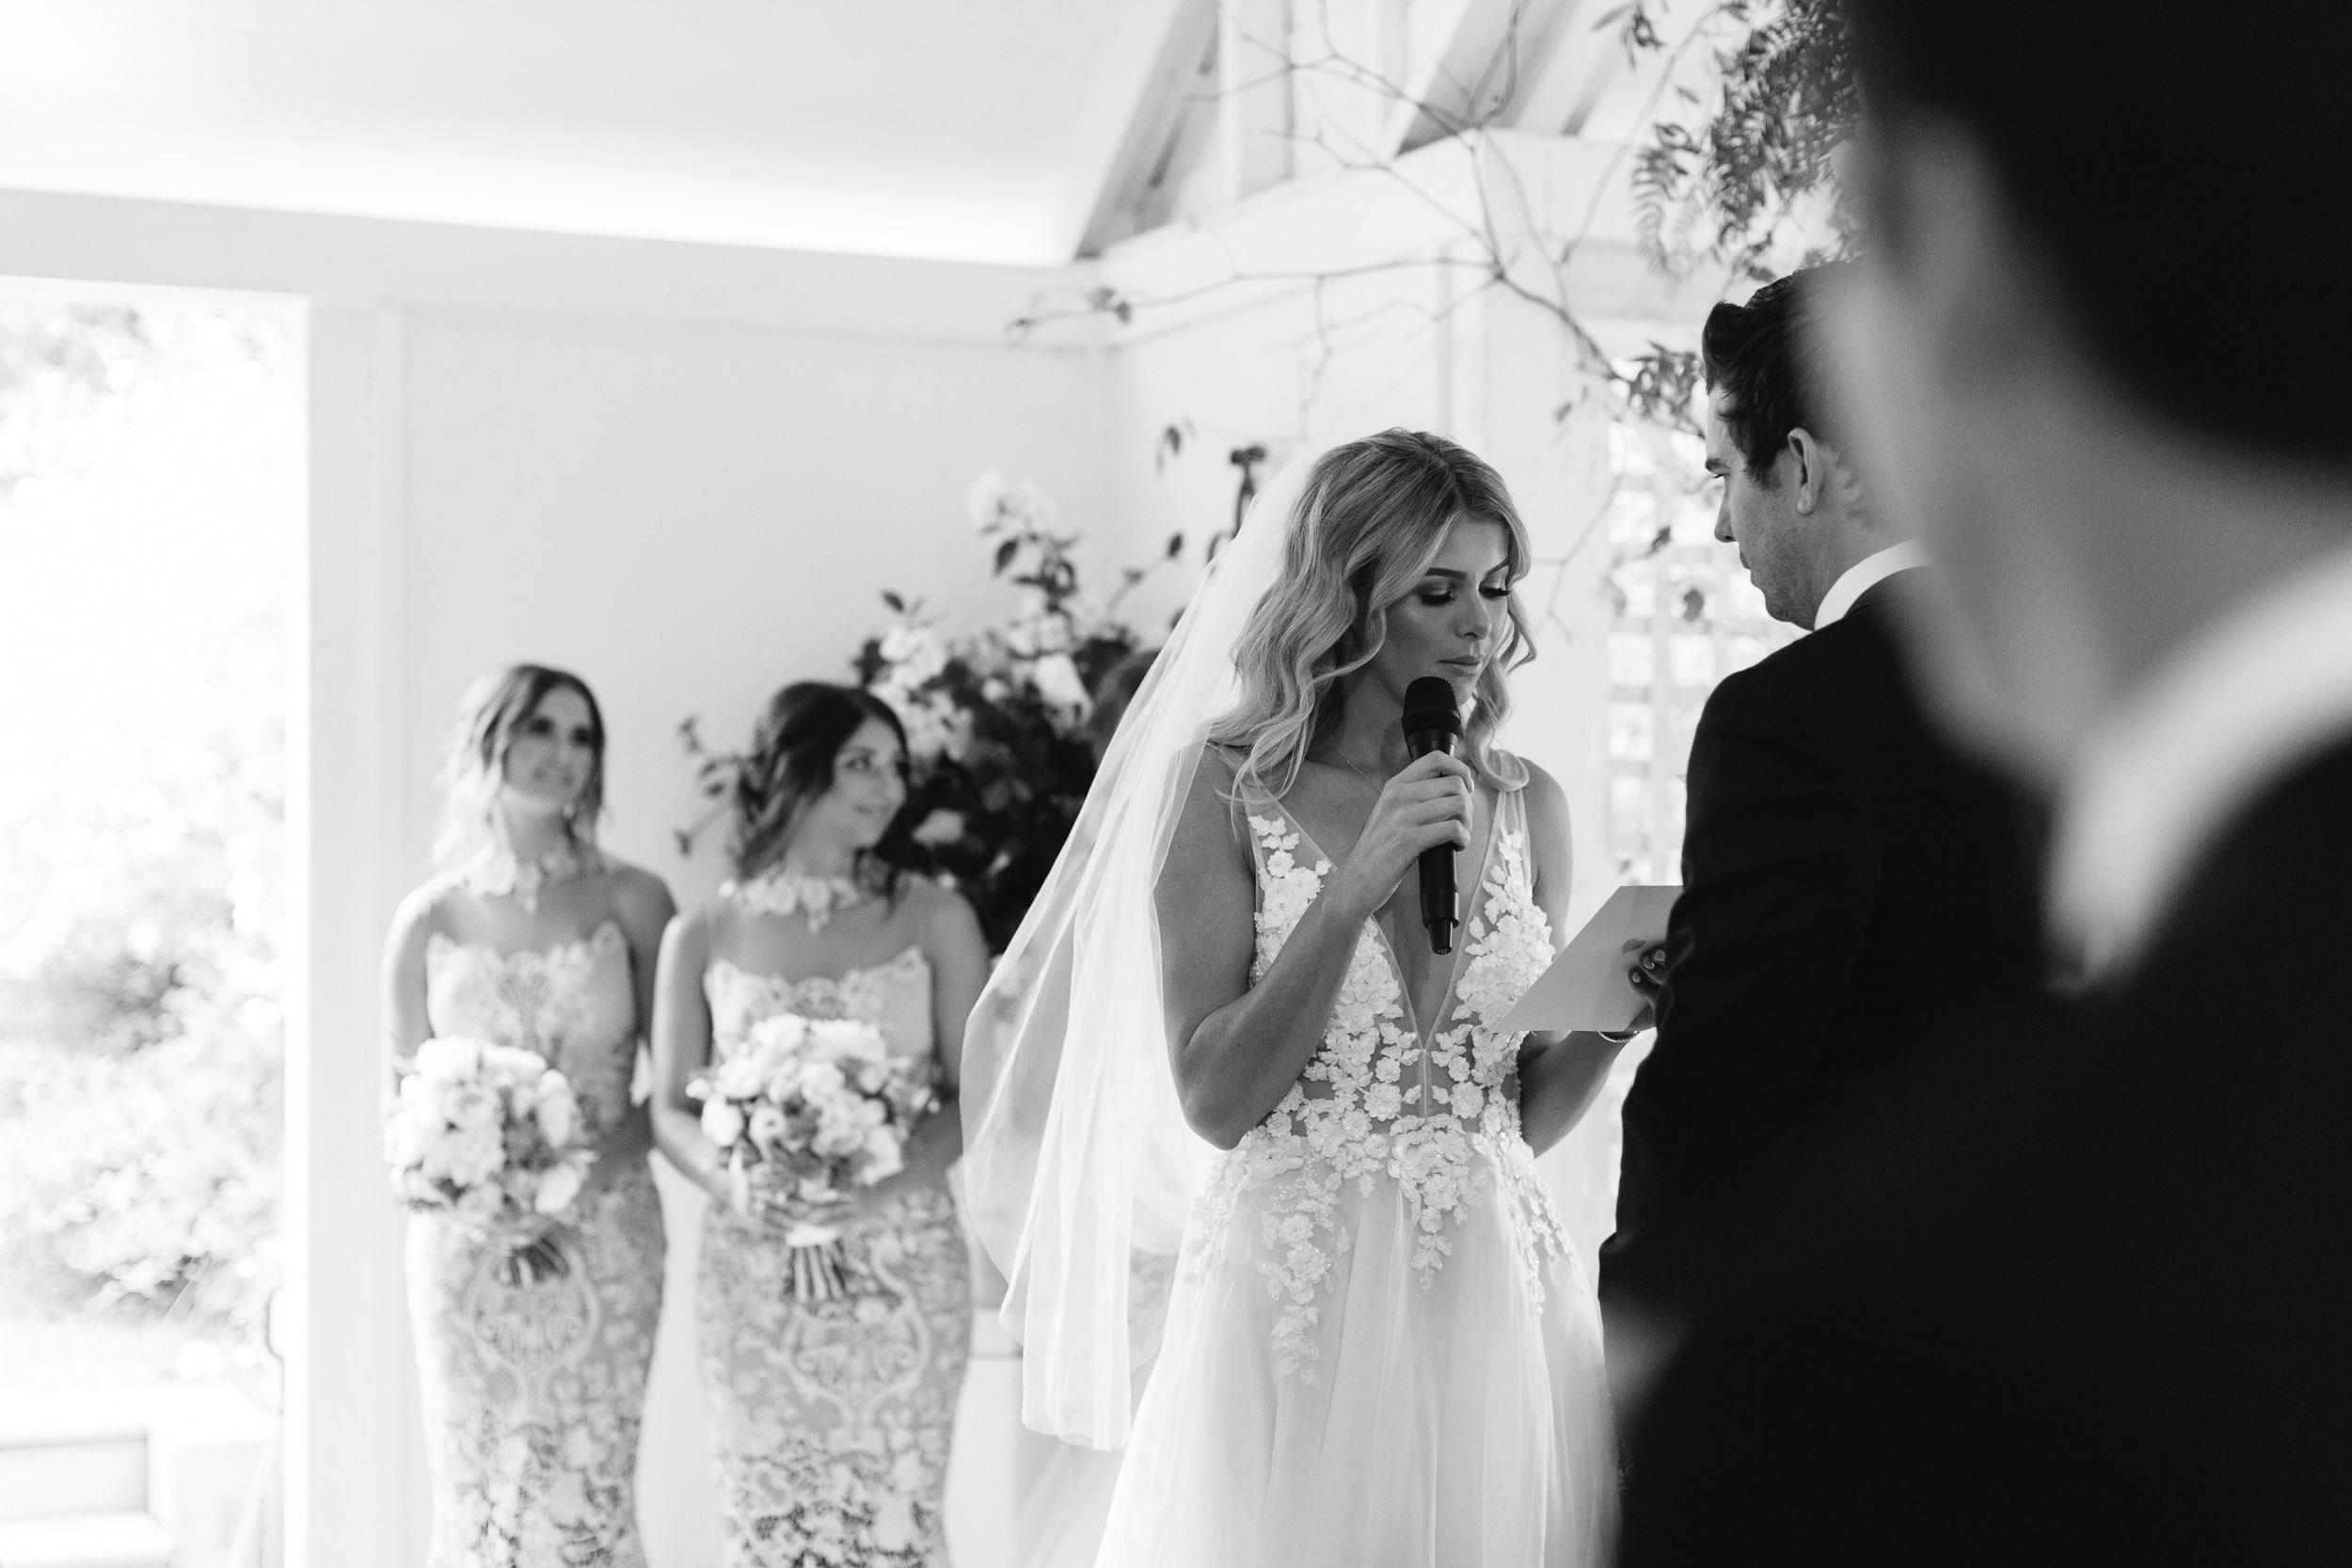 Kas-Richards-Mornington-Peninsula-Private-Property-Wedding-Marianna-Hardwick-Gown-271.jpg